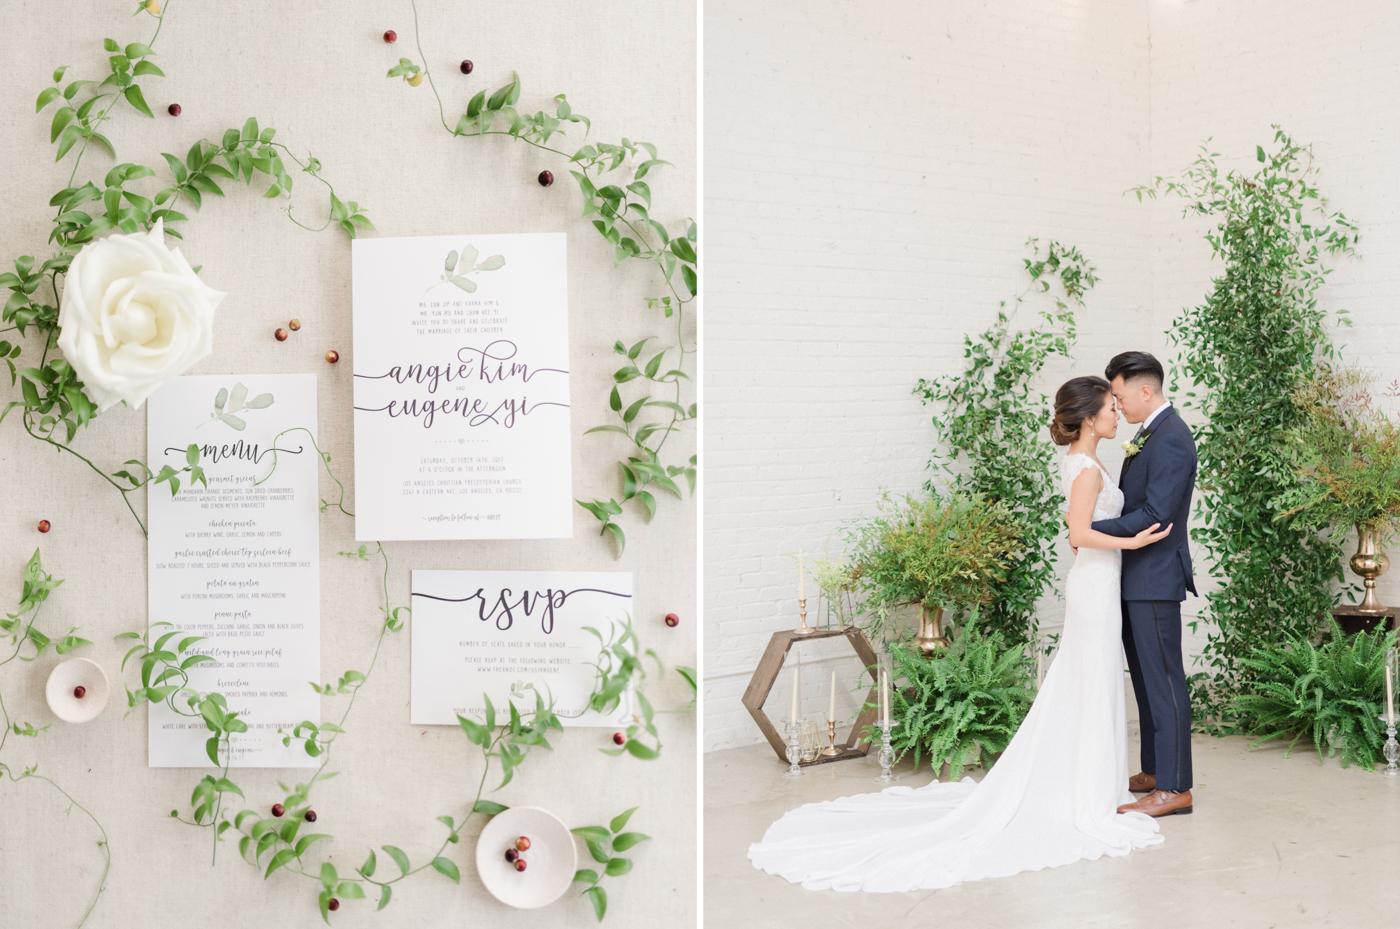 Modern_Wedding_HNYPT_Honeypot_LA_Photographer_Los_Angeles-1.jpg